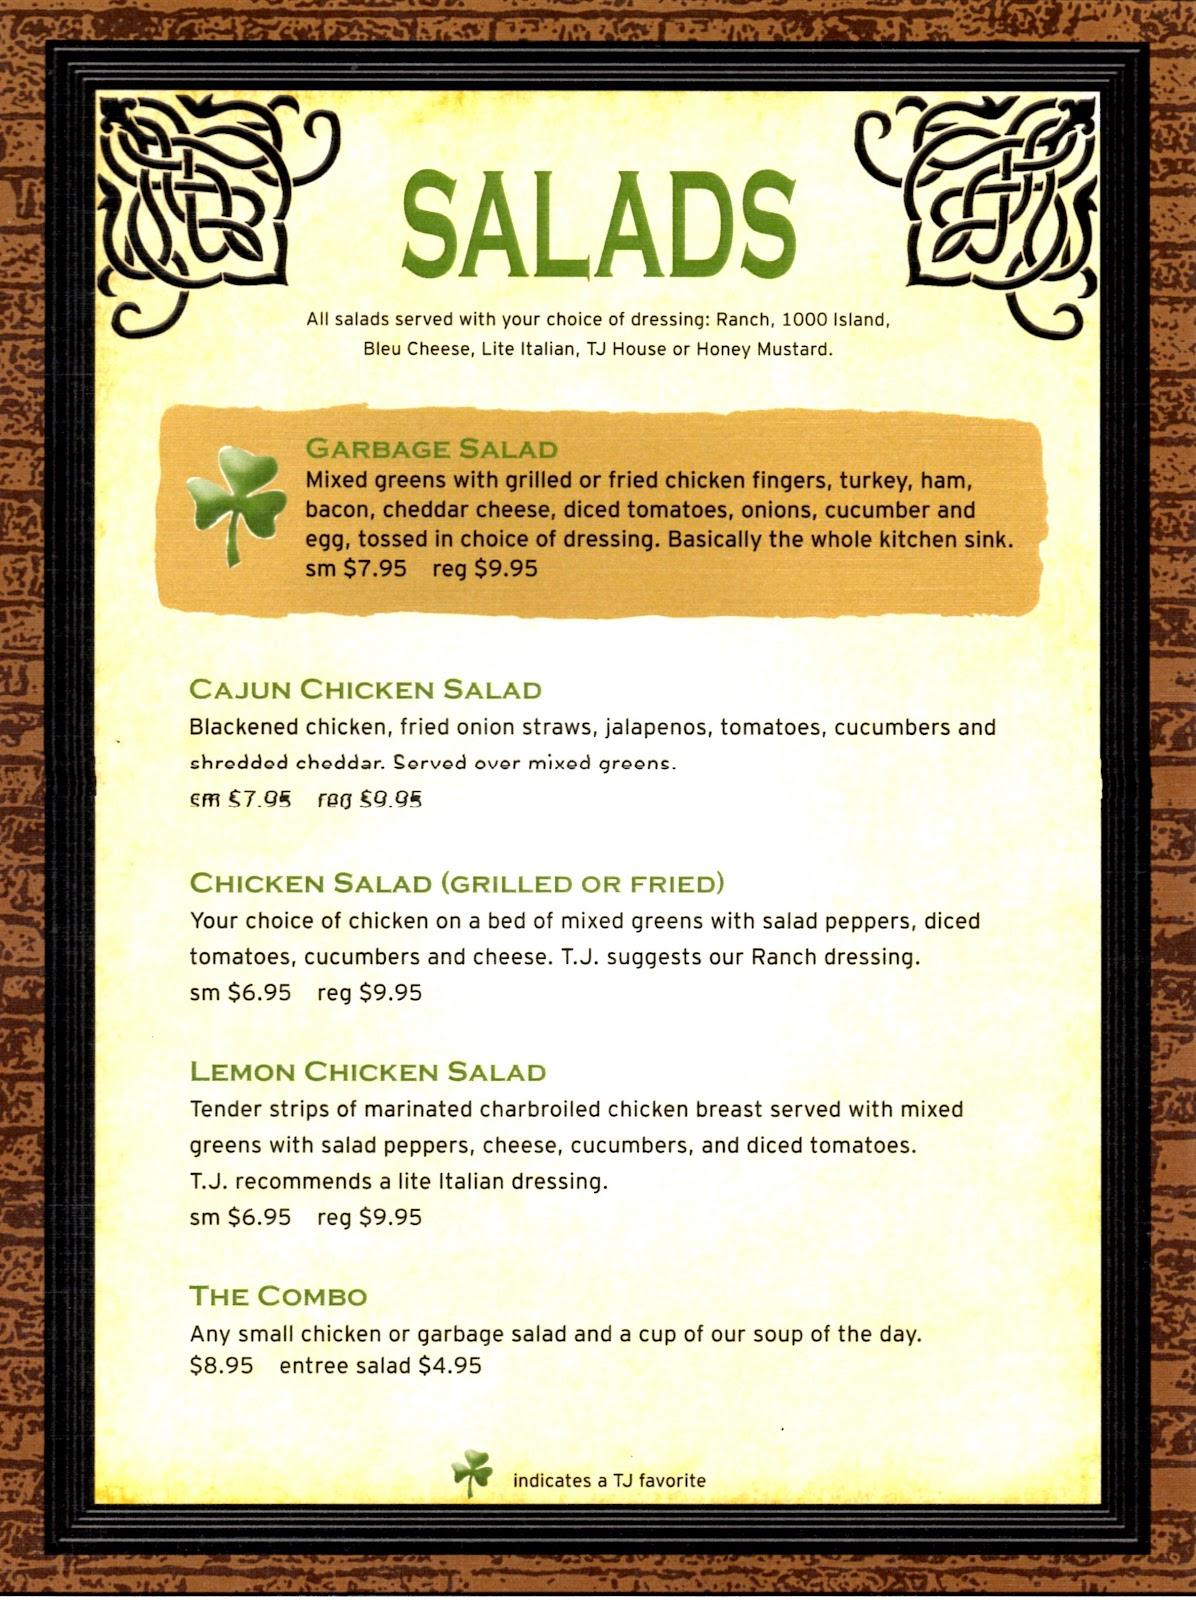 2017 Spr 3 Salads.jpg